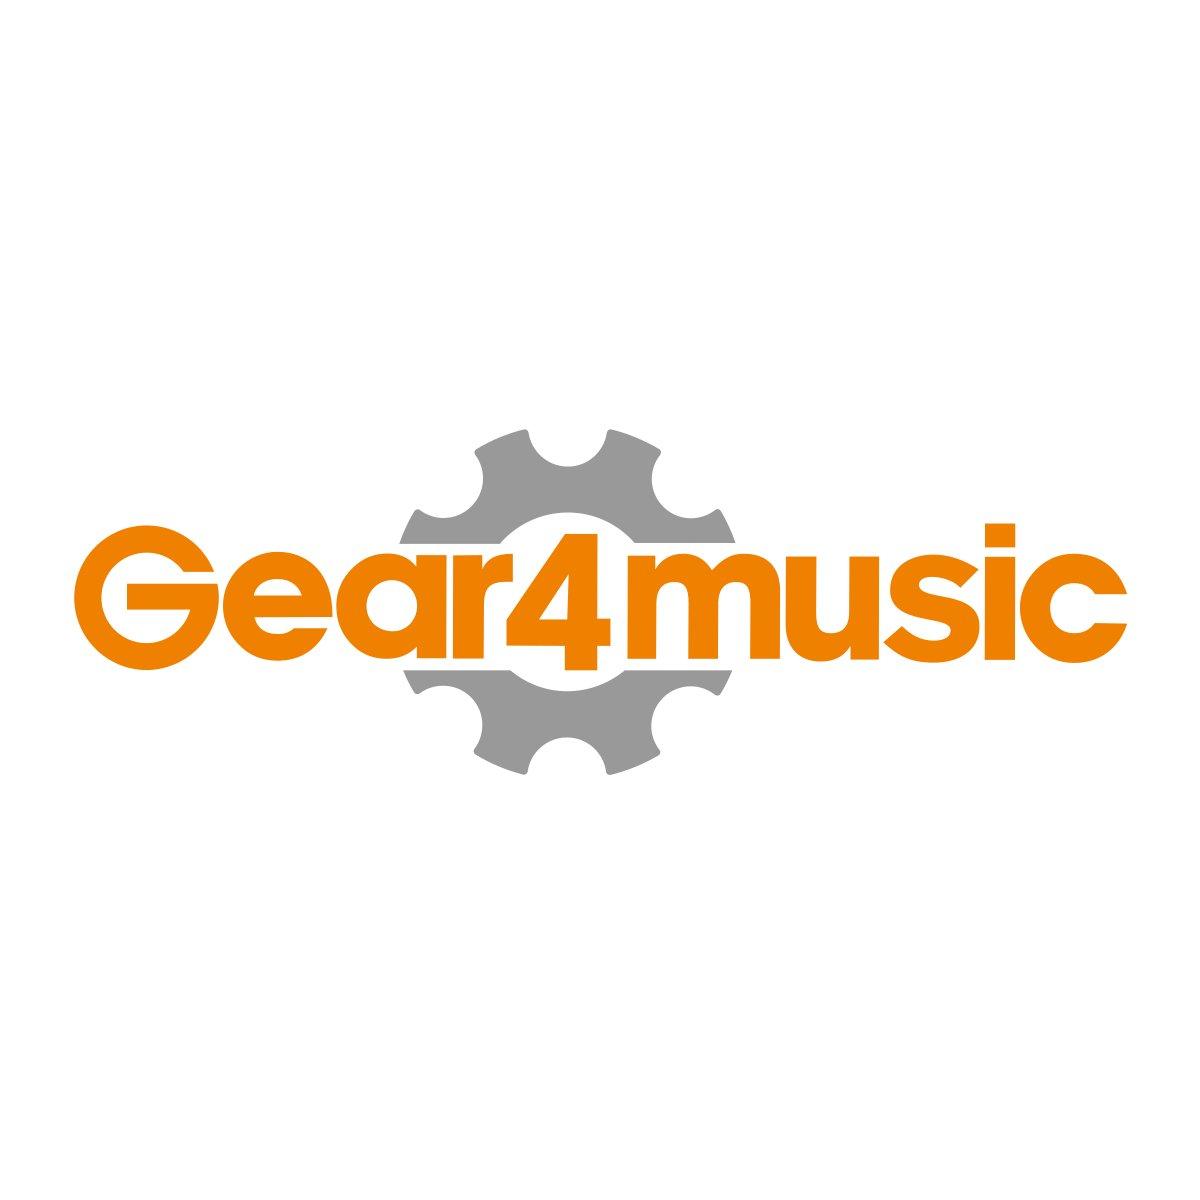 Kit chitarra classica Gear4music